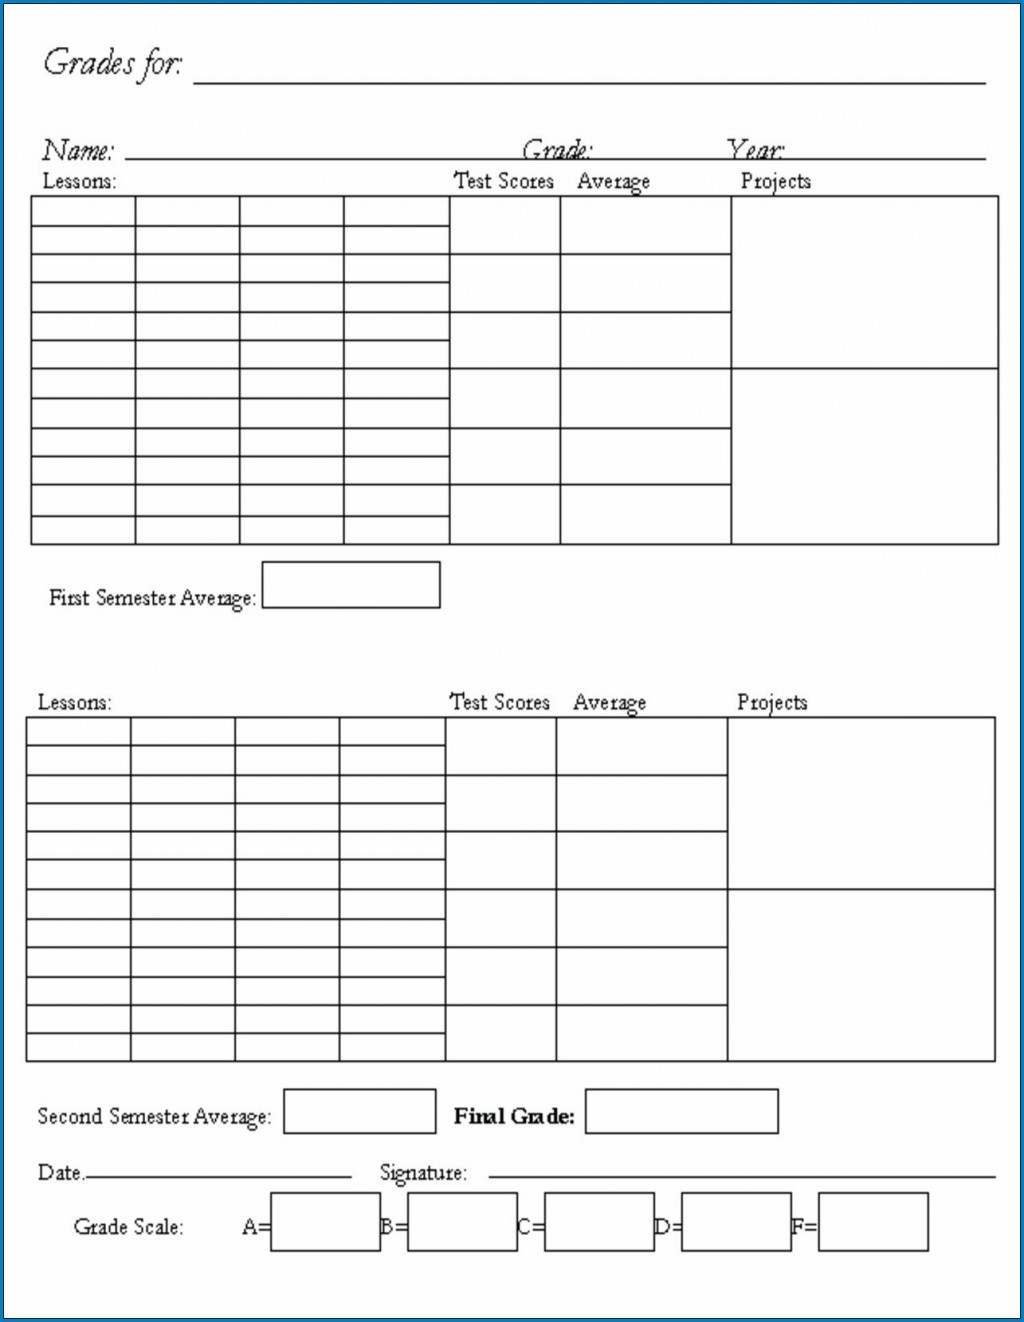 006 Unusual Homeschool Middle School Report Card Template High Definition  8th Grade TranscriptLarge